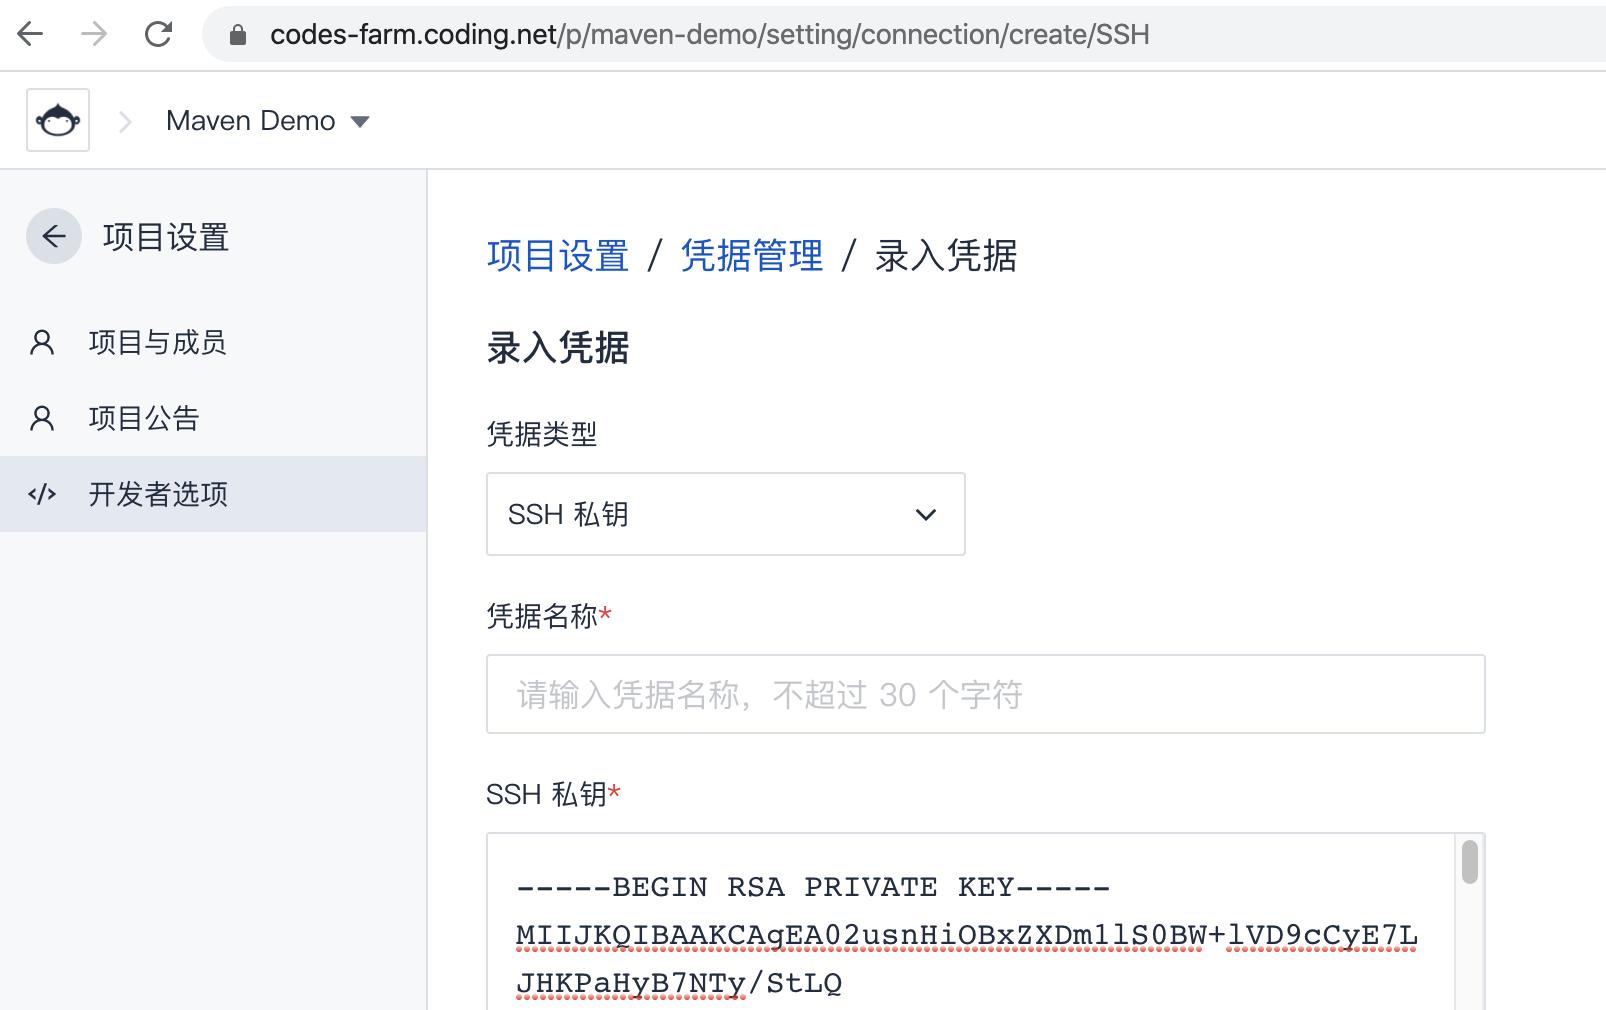 CODING 凭据管理 录入 SSH 私钥